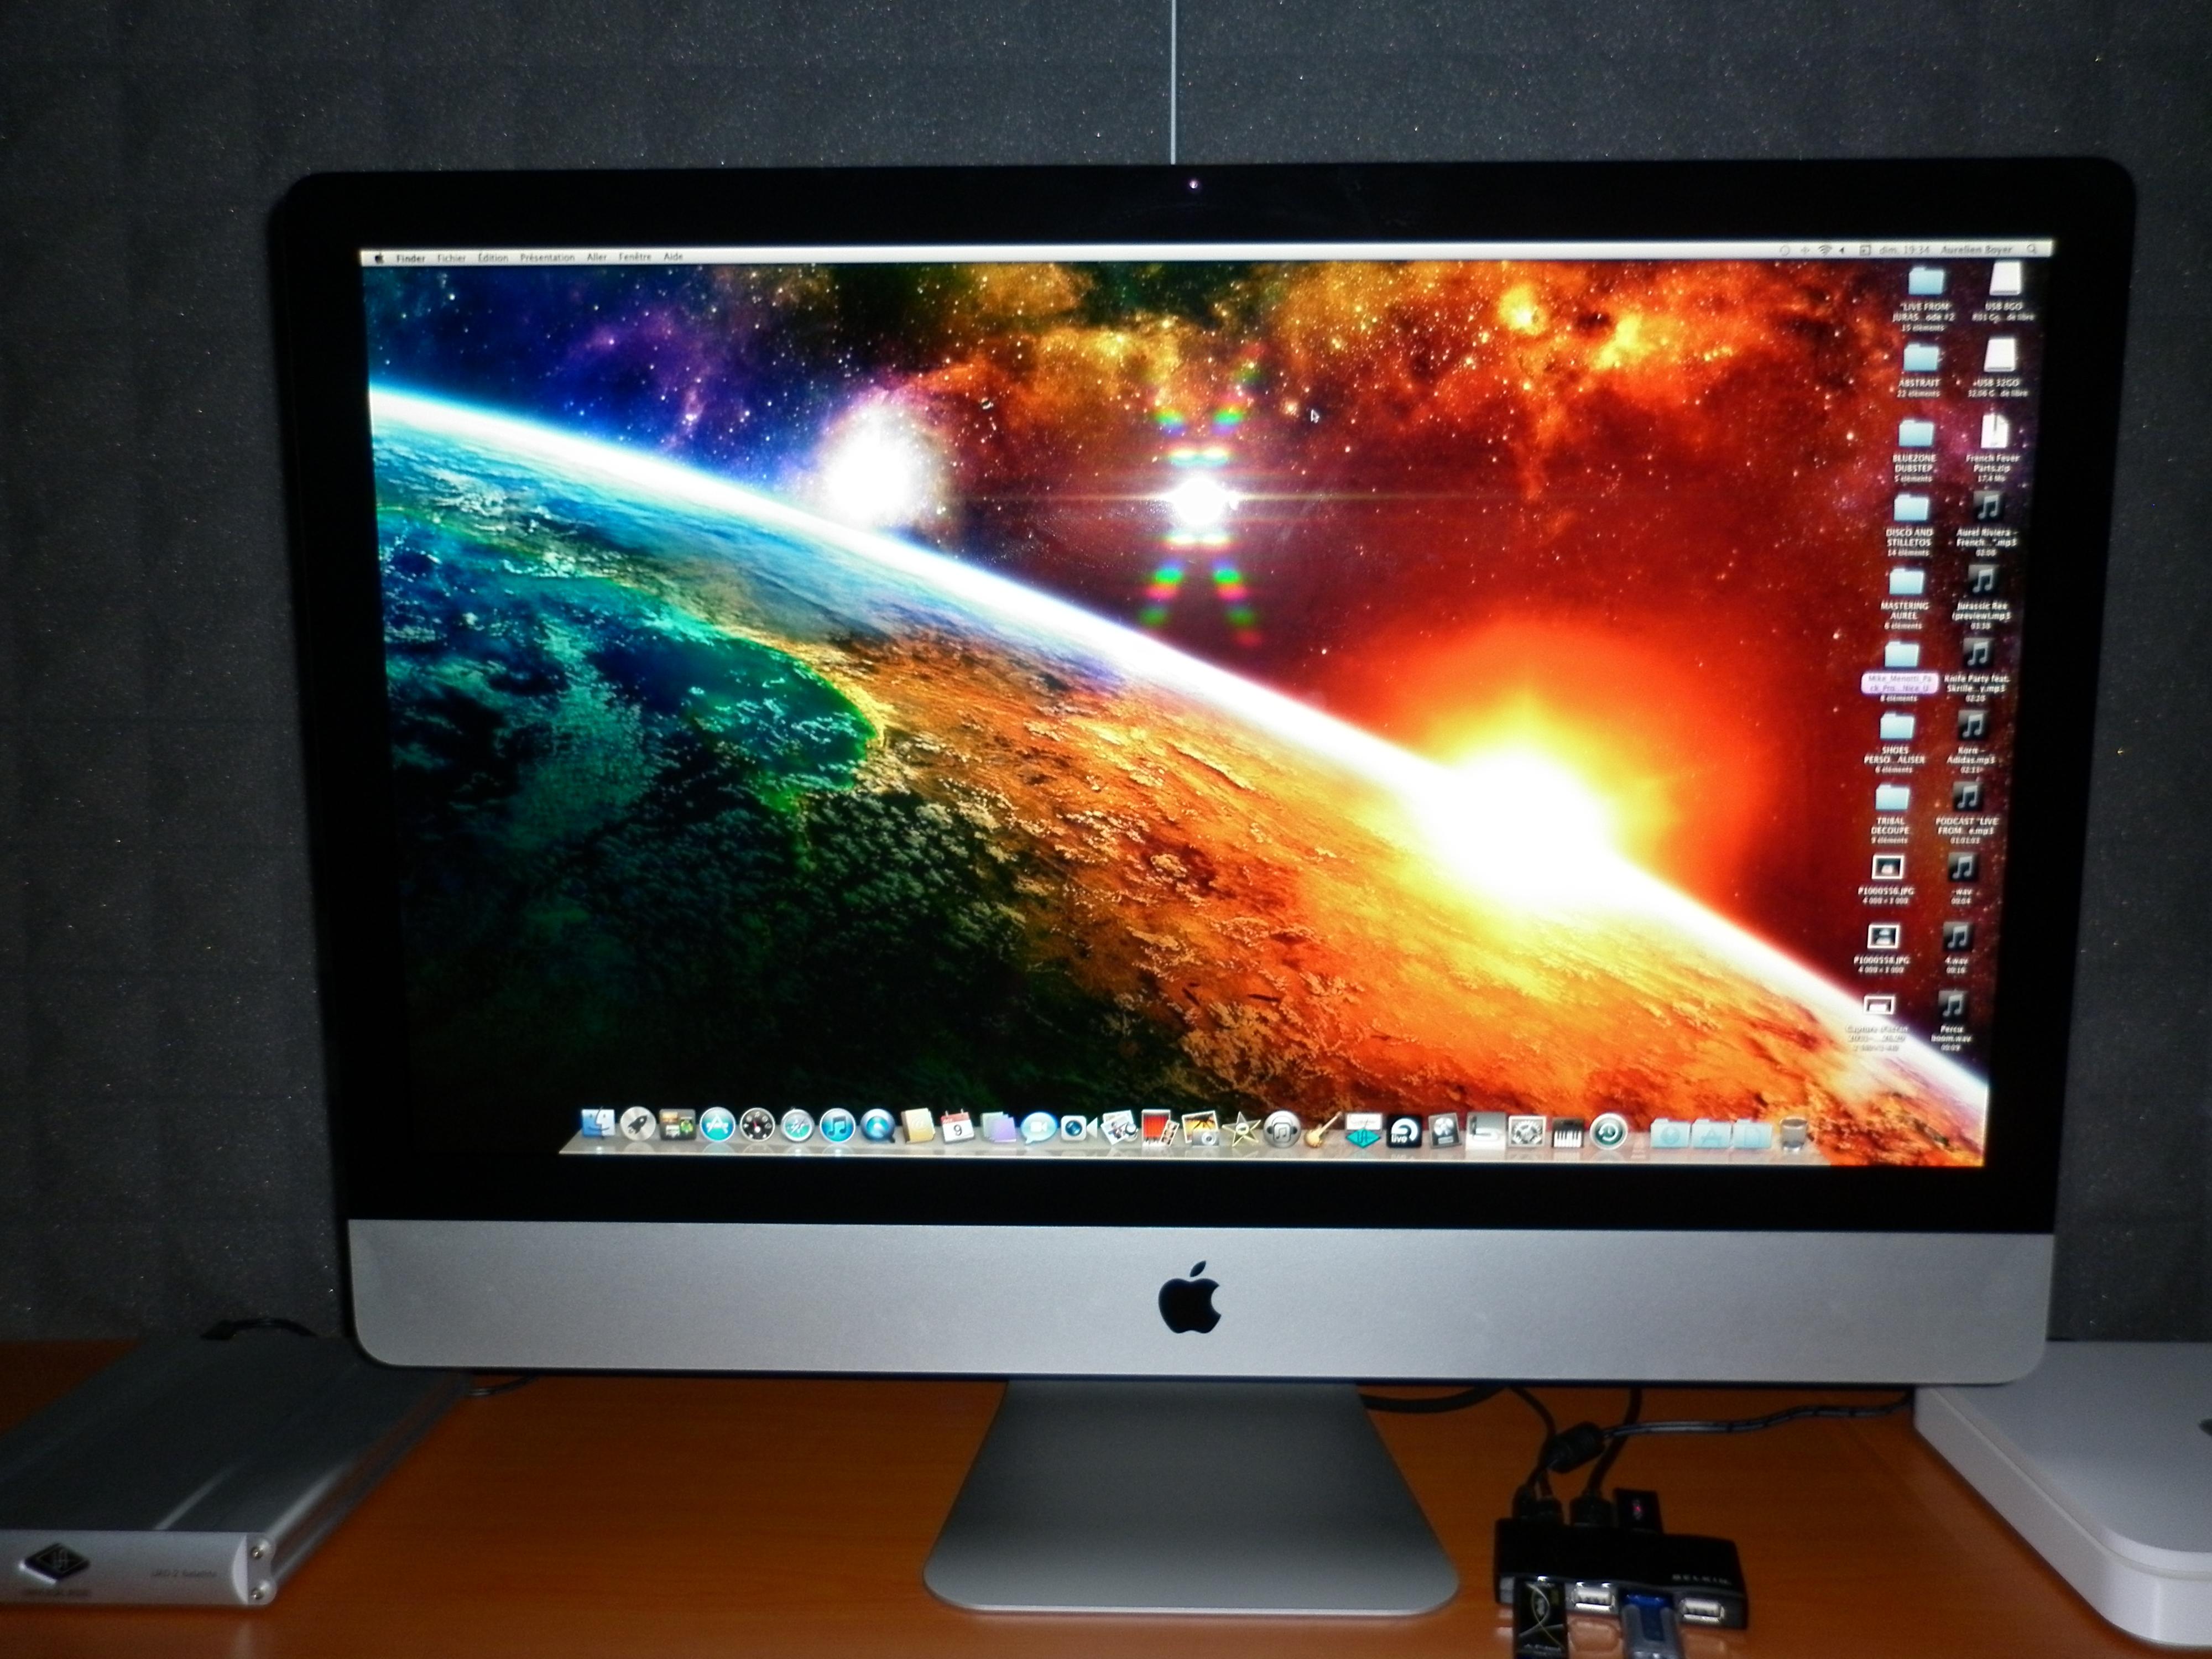 ordinateur bureau apple imac  ghz quad core intel i gb medias photos aplaym